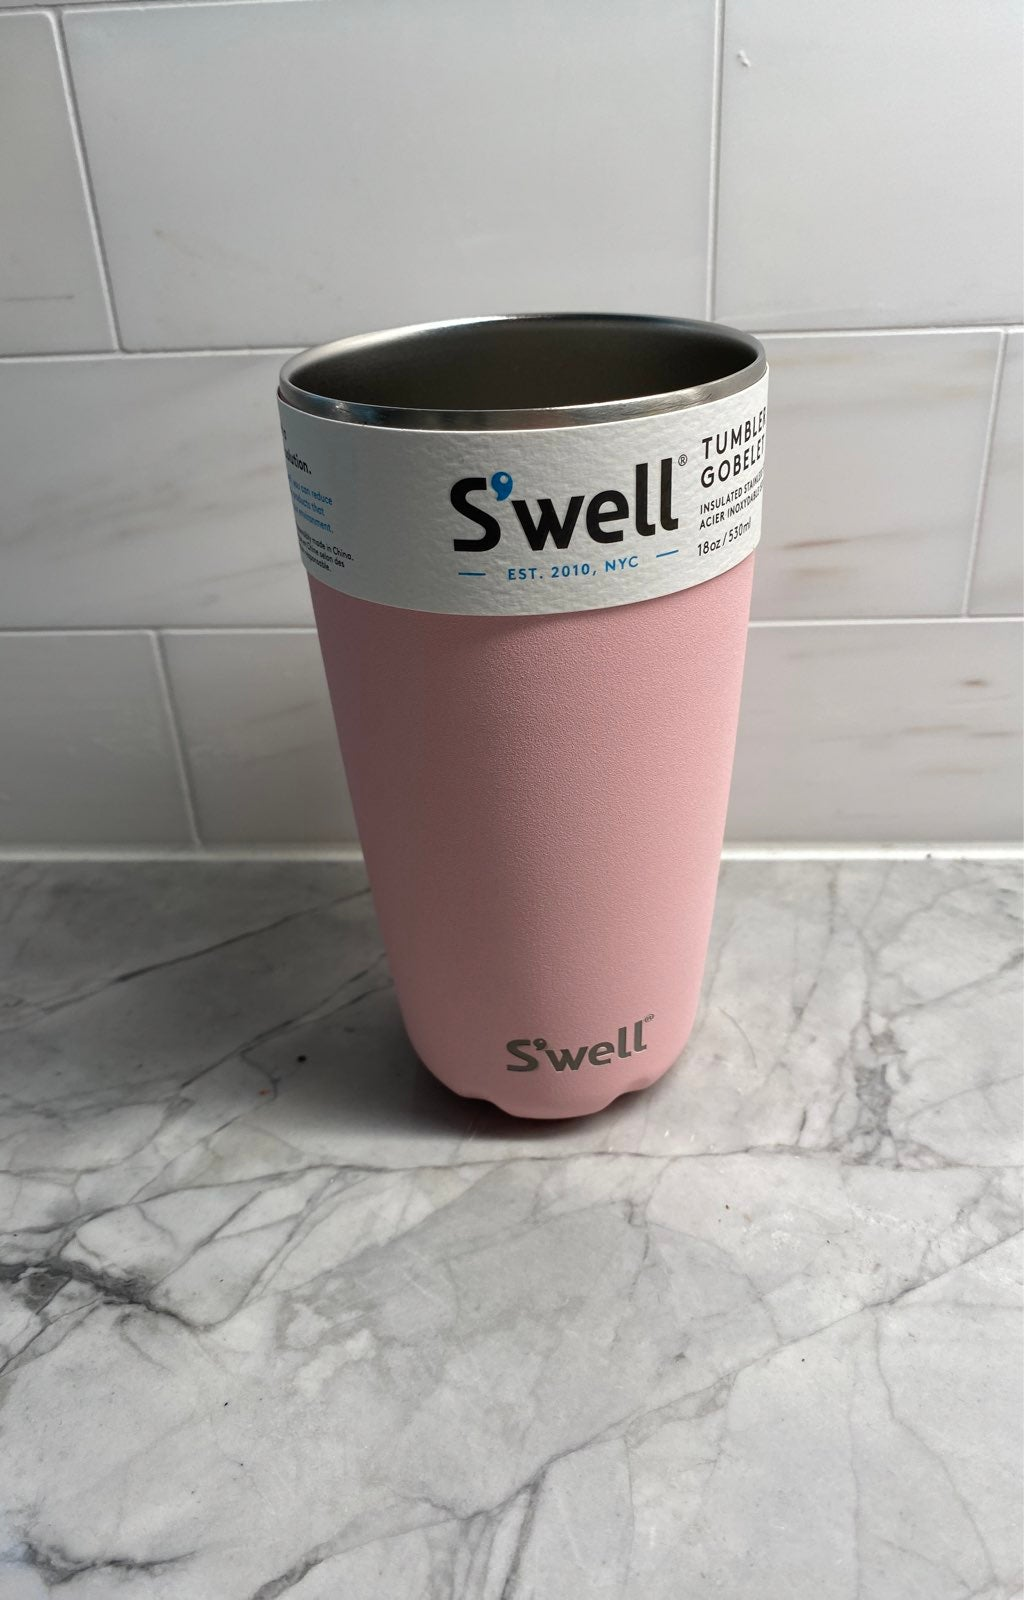 NWT Swell tumbler gobelet pink